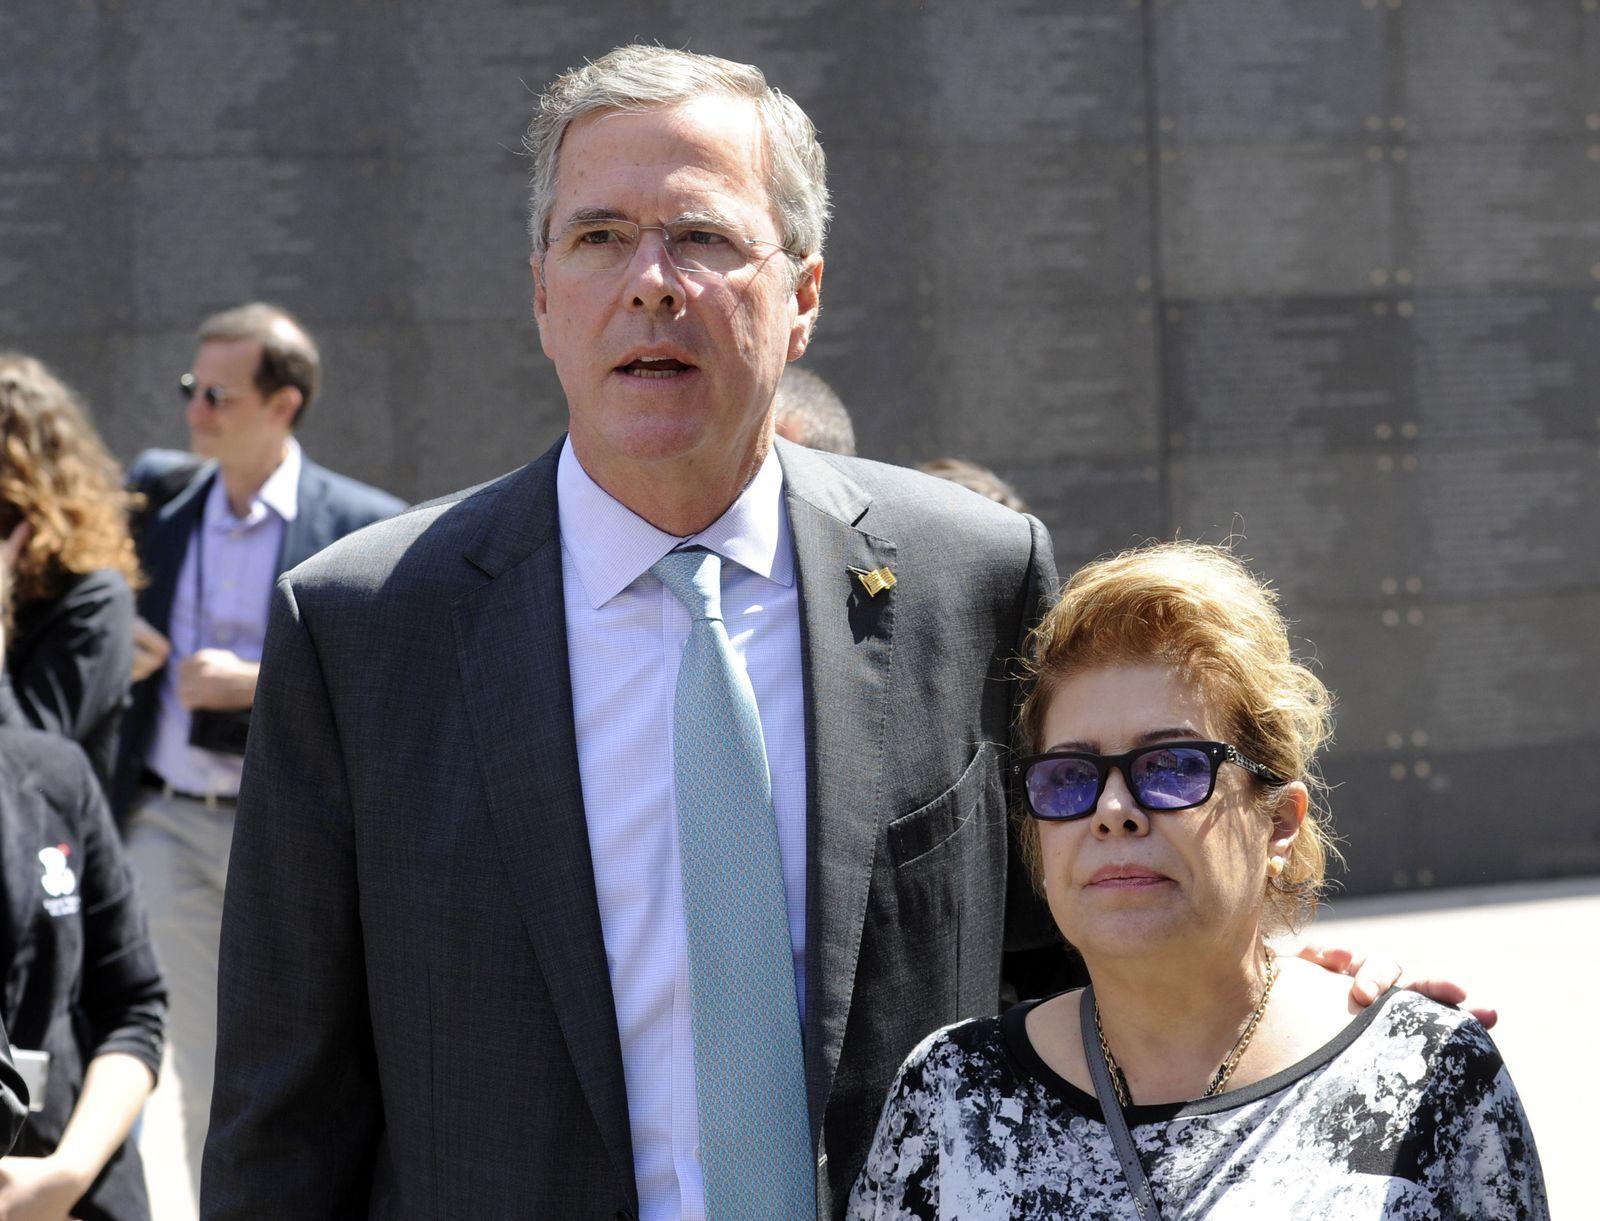 Jeb Bush / Columba Bush